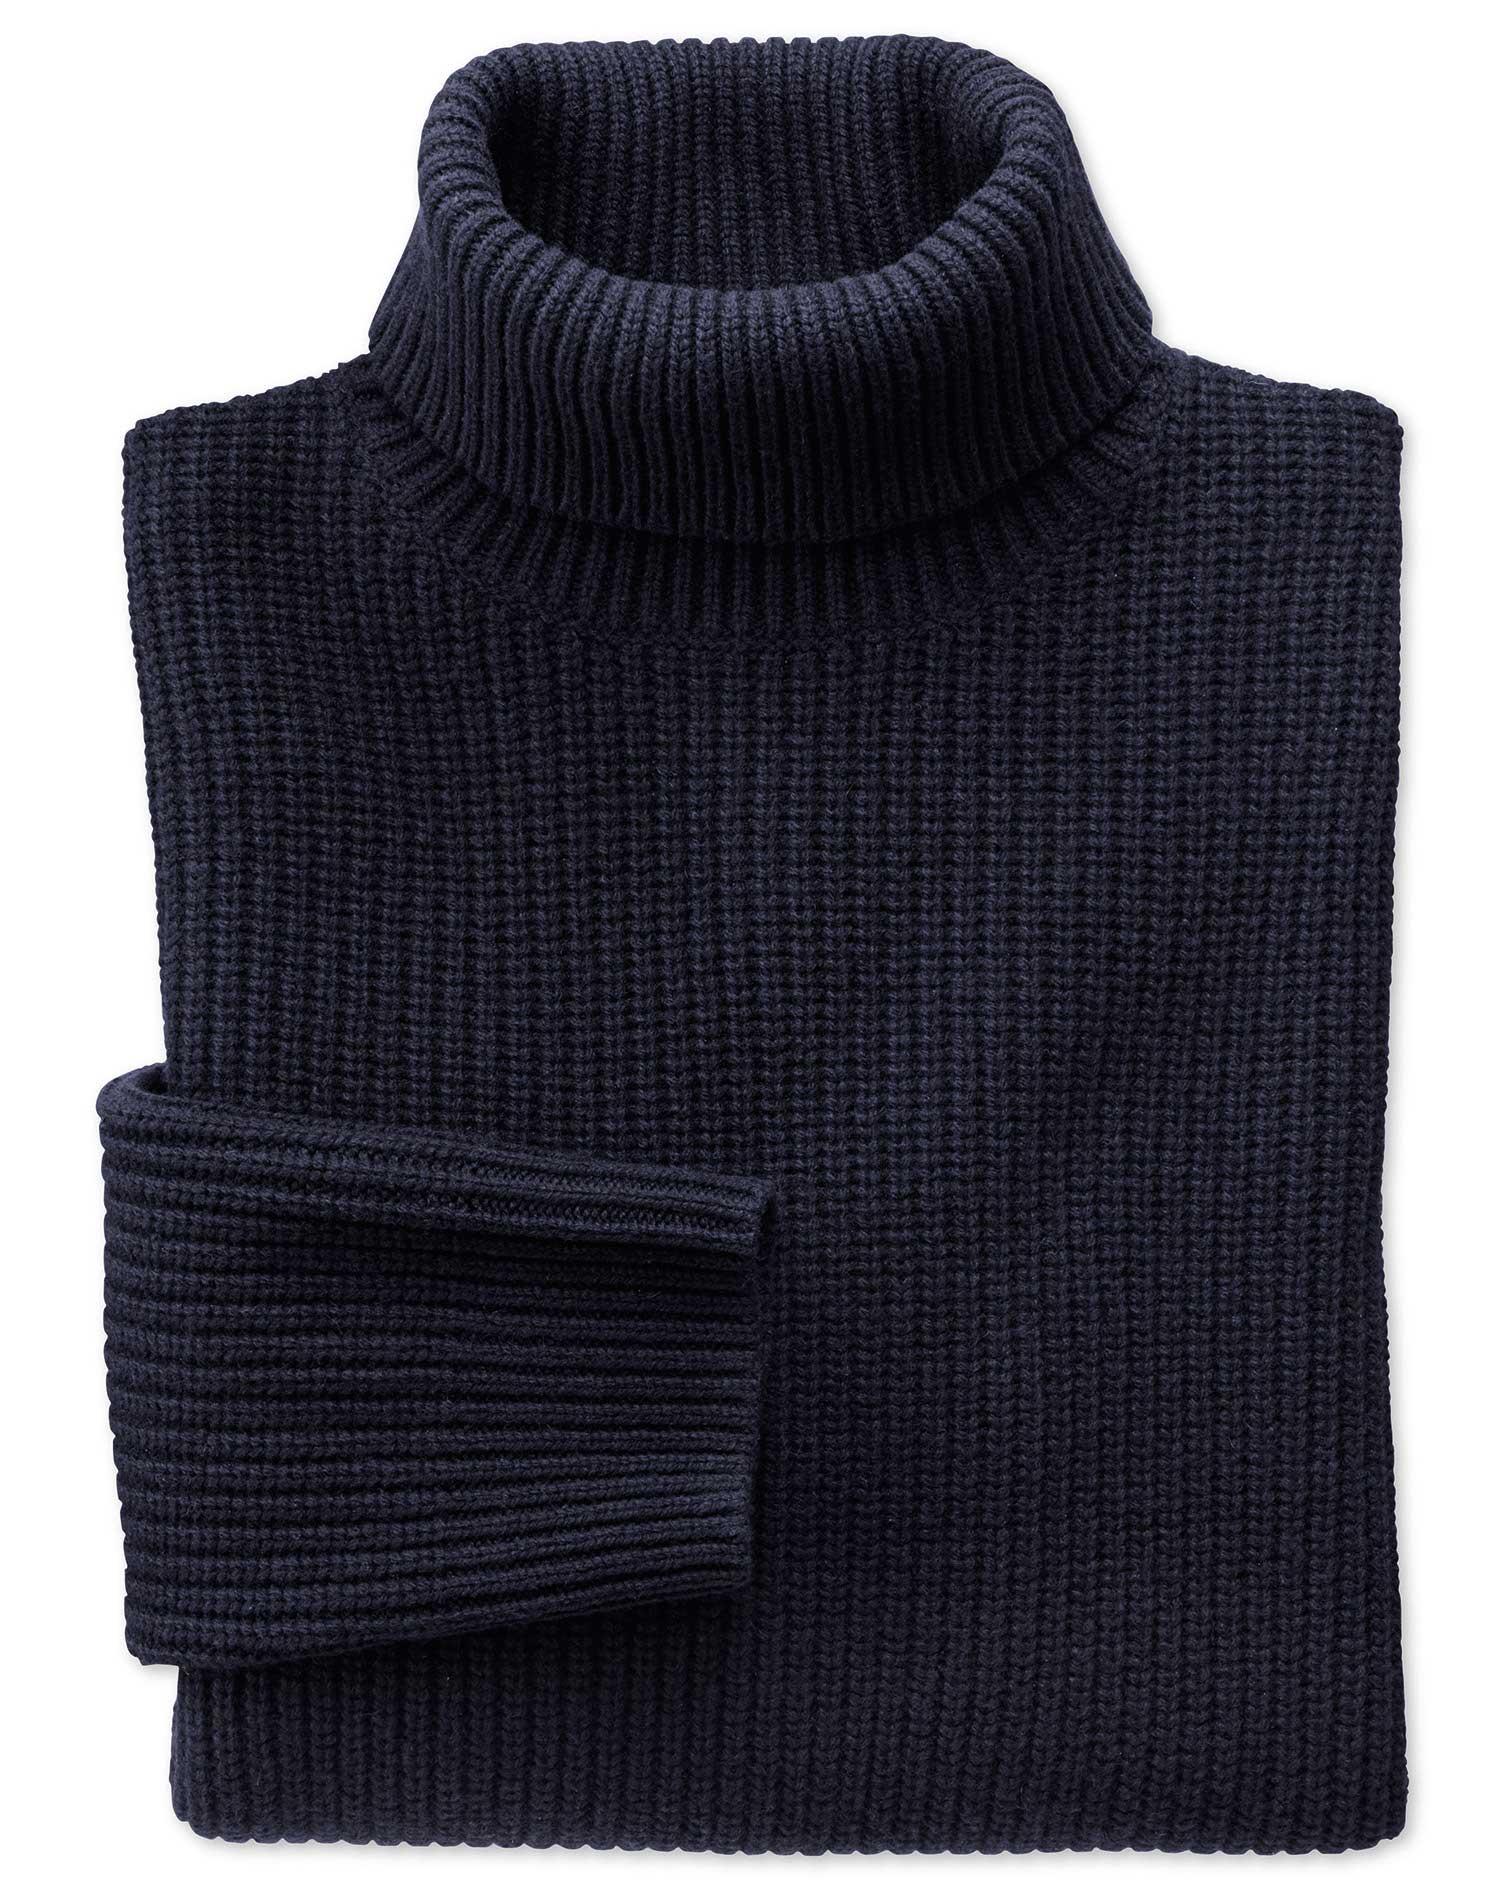 Navy Rib Roll Neck Wool Jumper Size XXXL by Charles Tyrwhitt